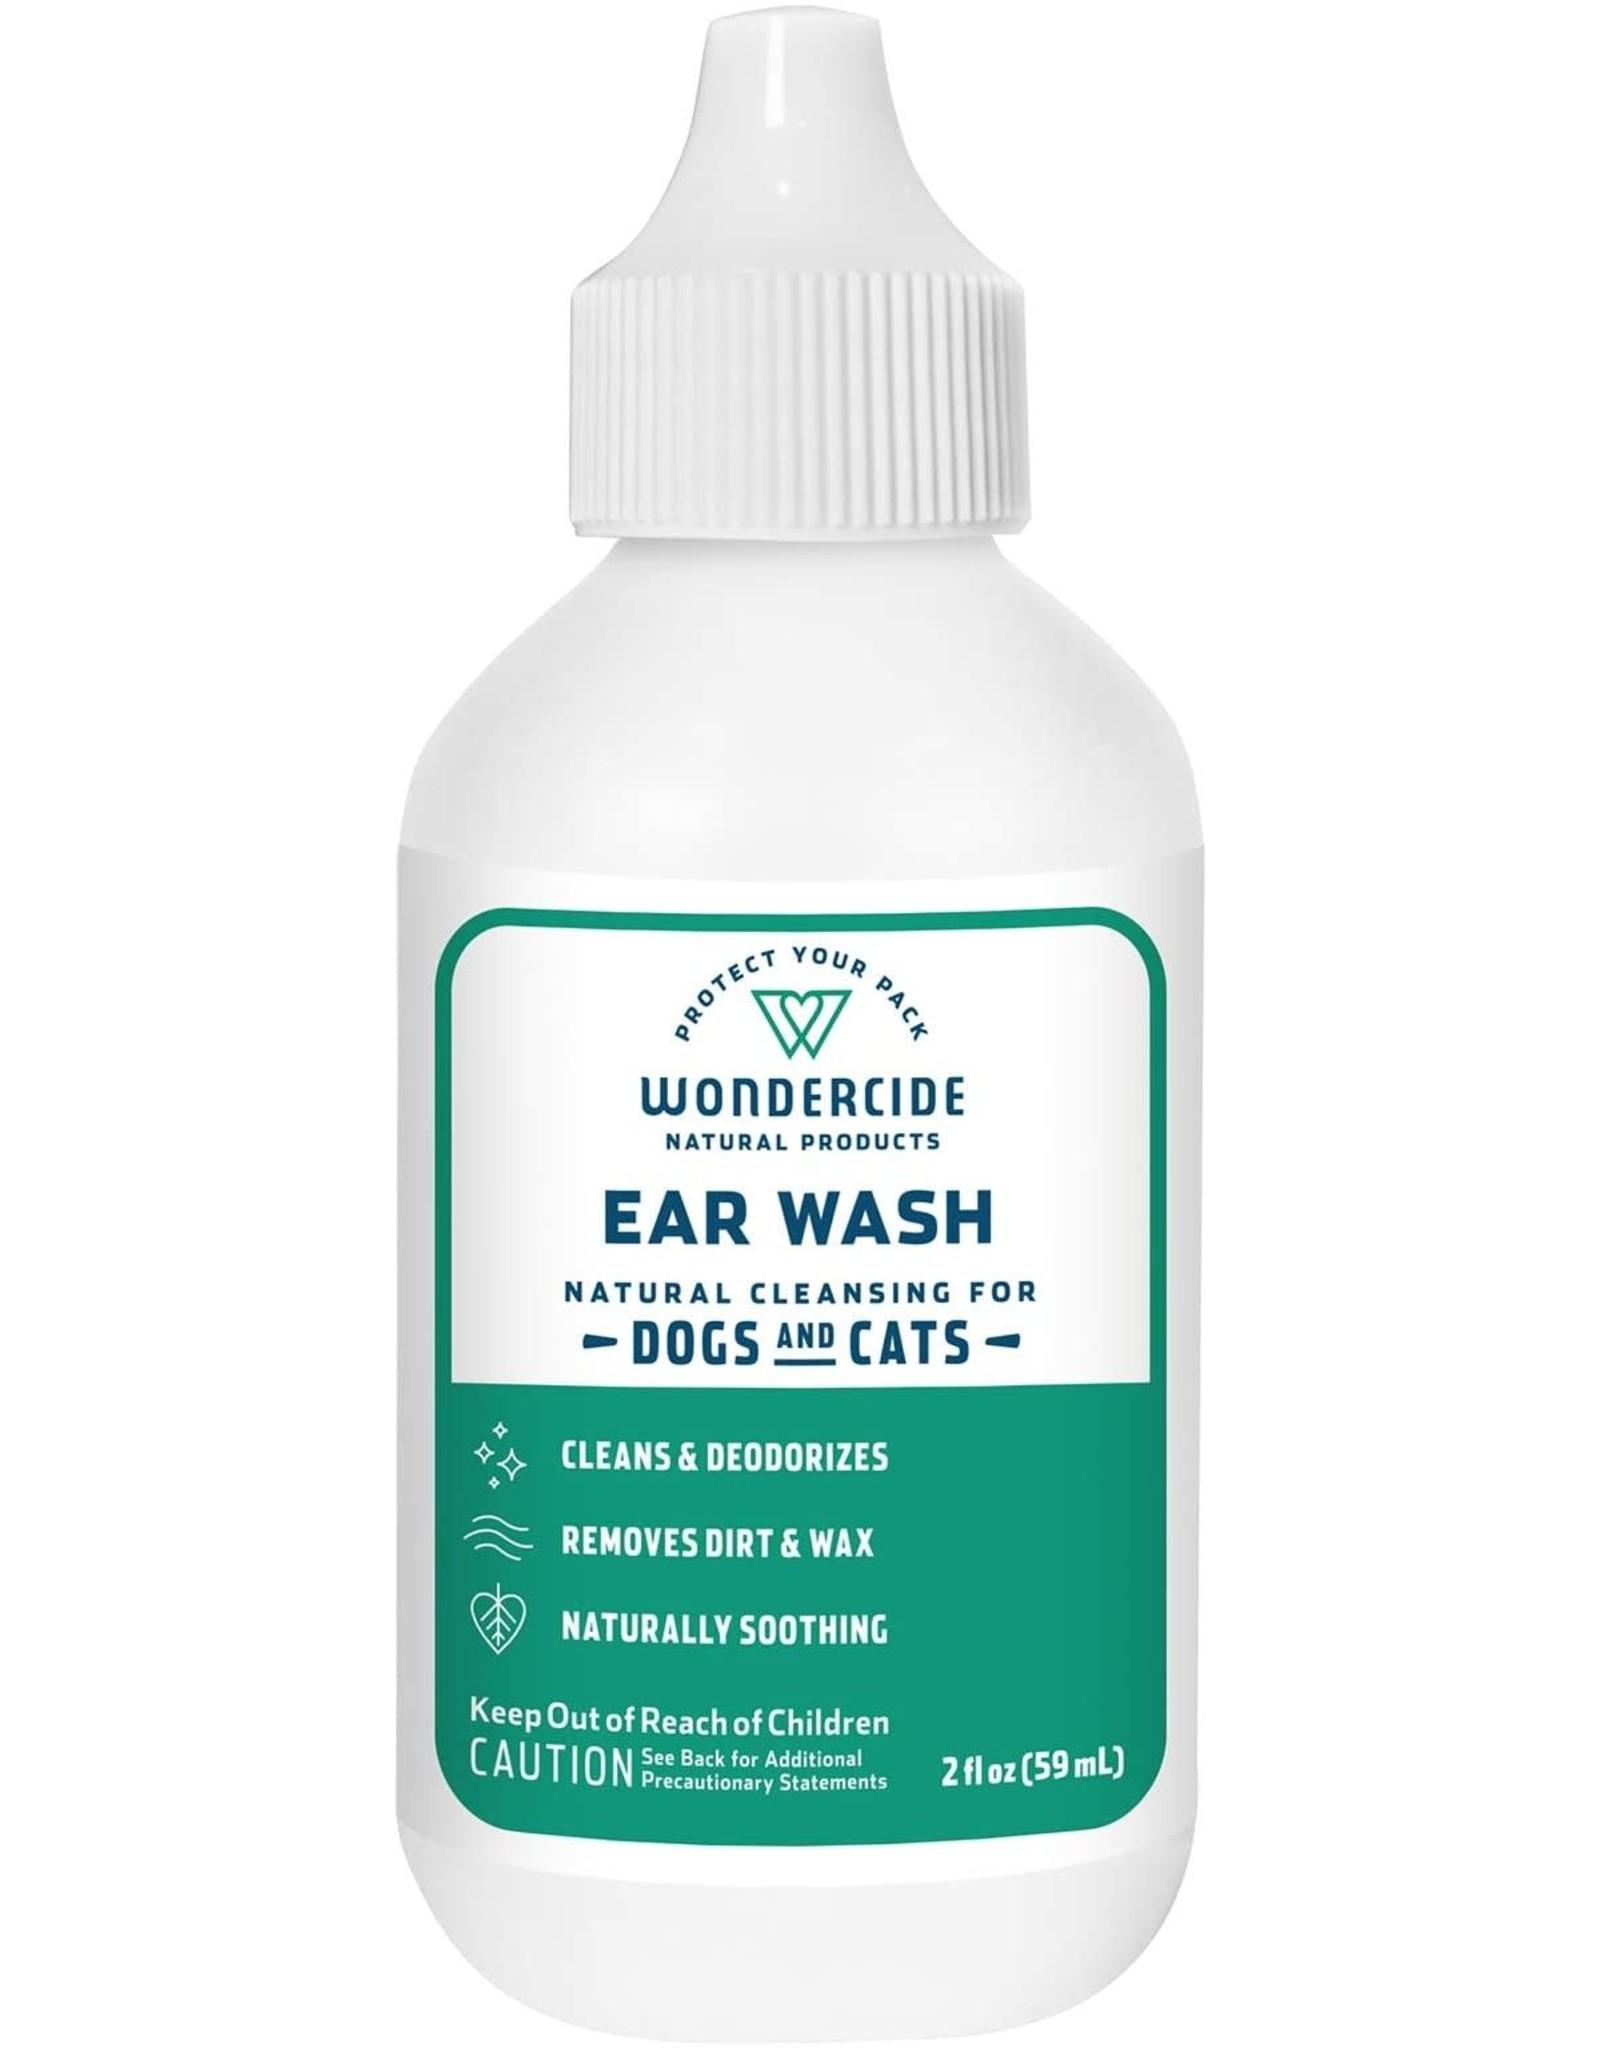 Wondercide WONDERCIDE DEODORIZING EAR WASH FOR DOGS & CATS 2OZ